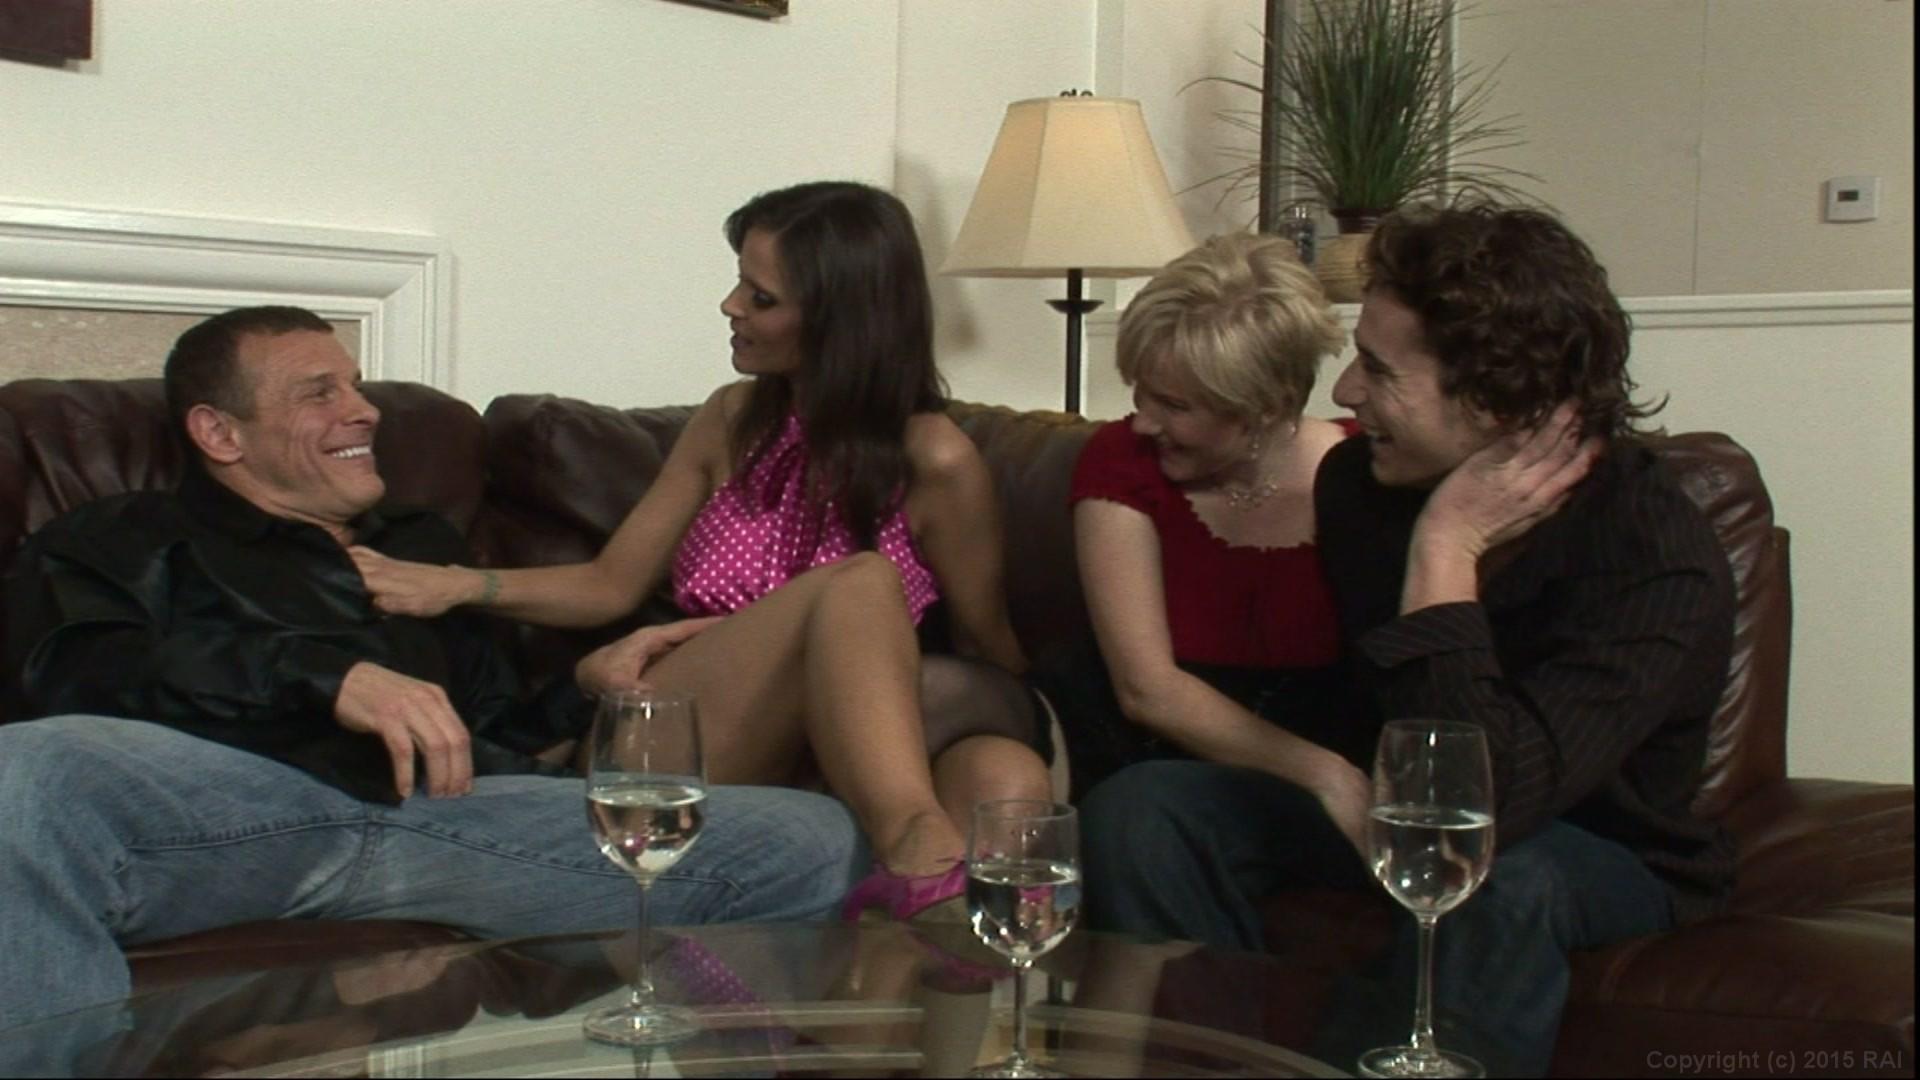 Danbury texas swingers ladies seeking casual sex tx danbury wants dick